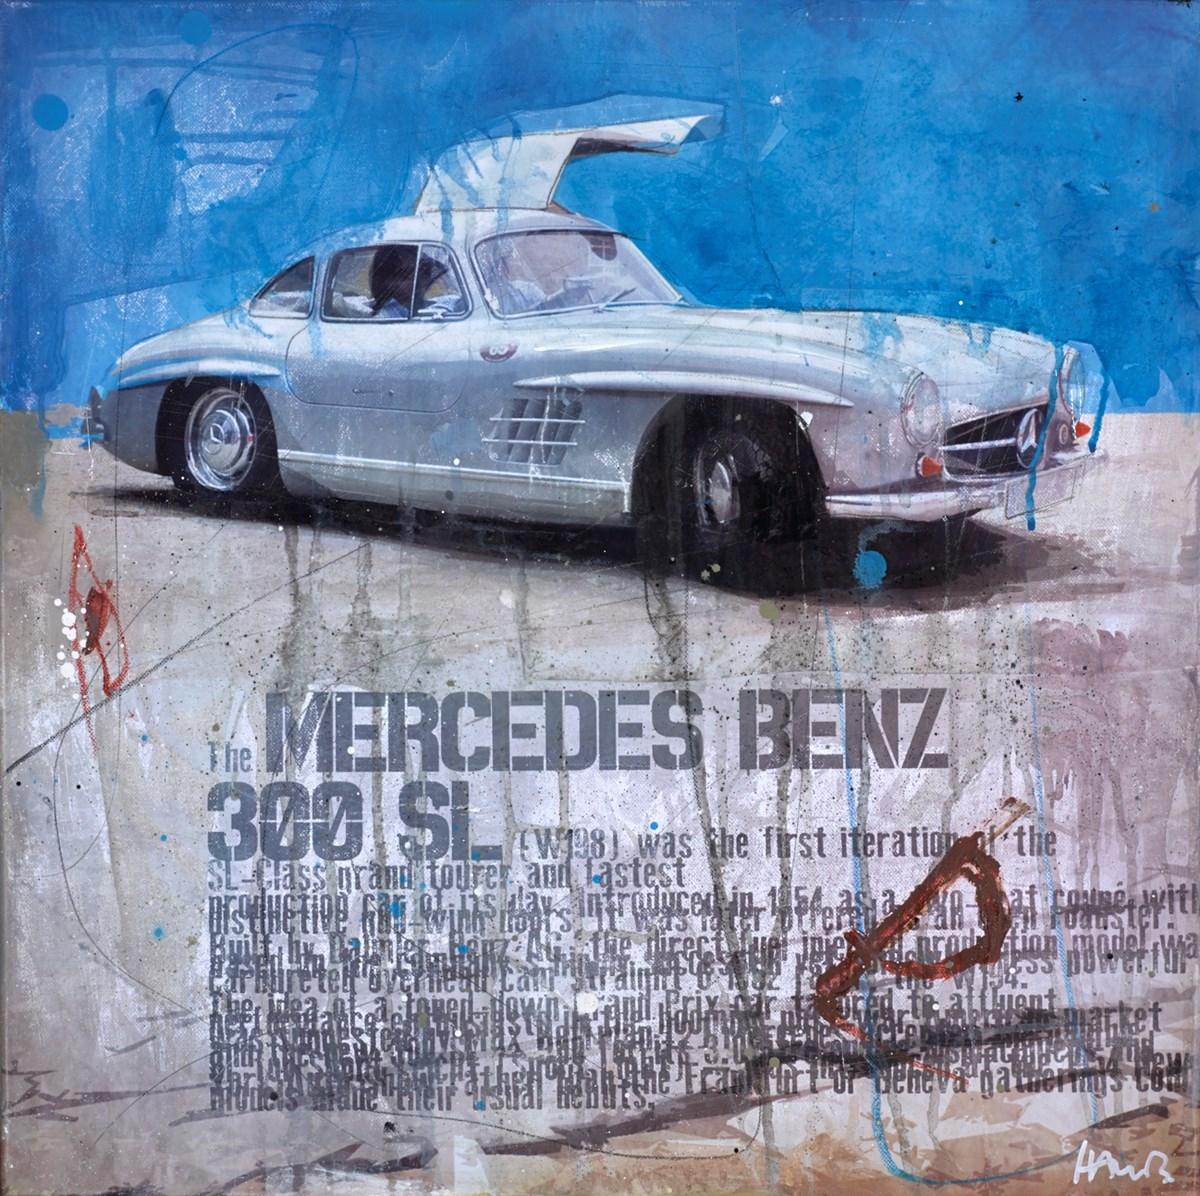 The Mercedez-Benz 300 SL